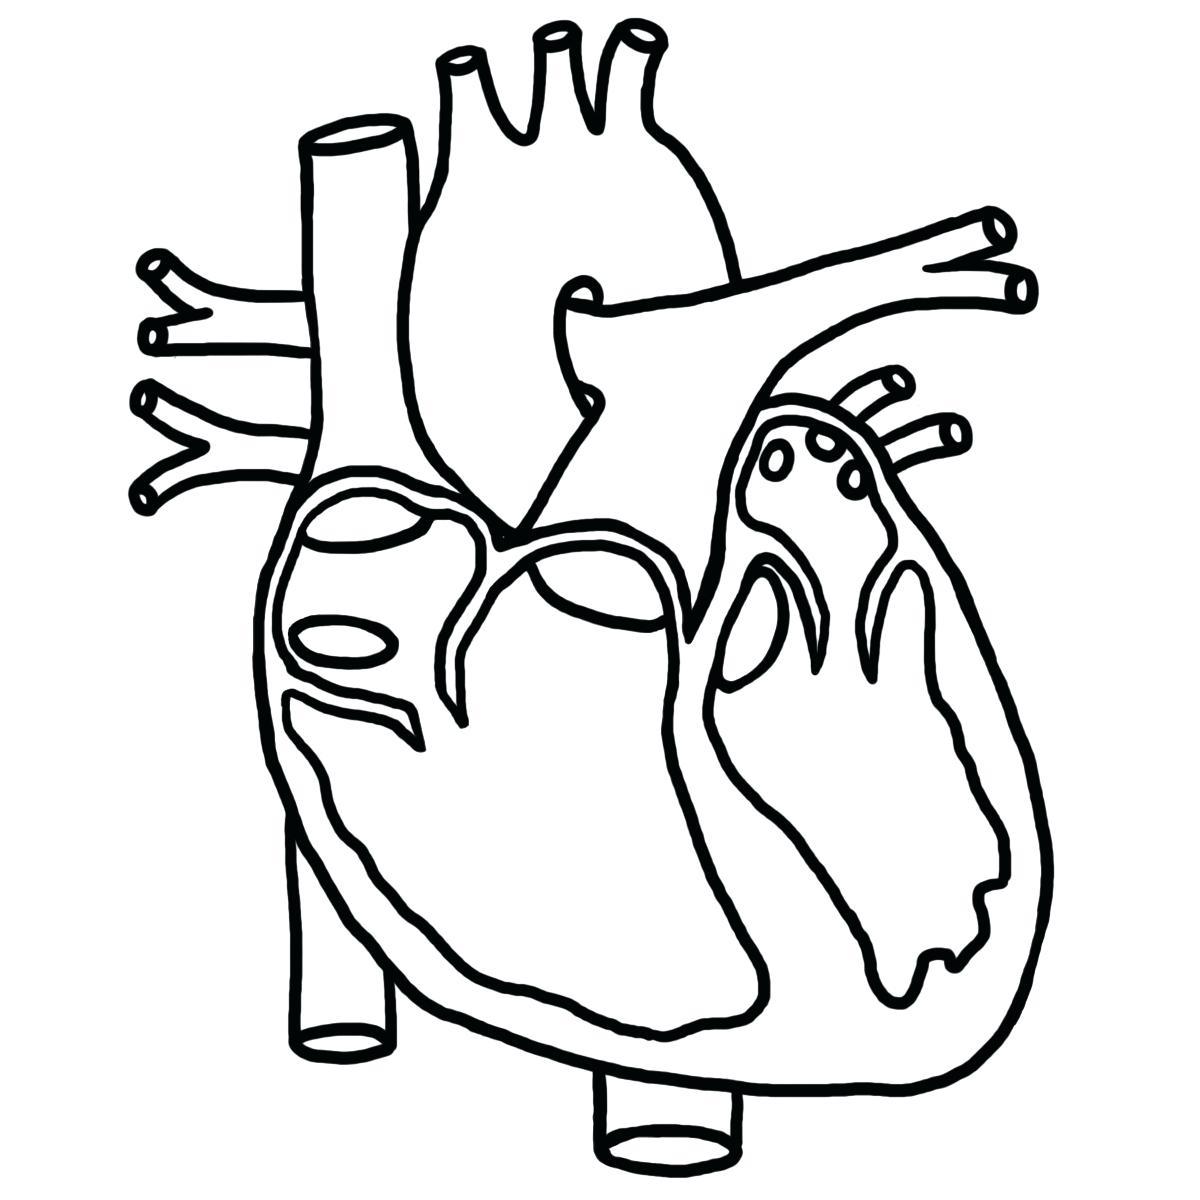 1200x1200 Diagram Anatomical Heart Diagram Organs 4 Human Anatomy